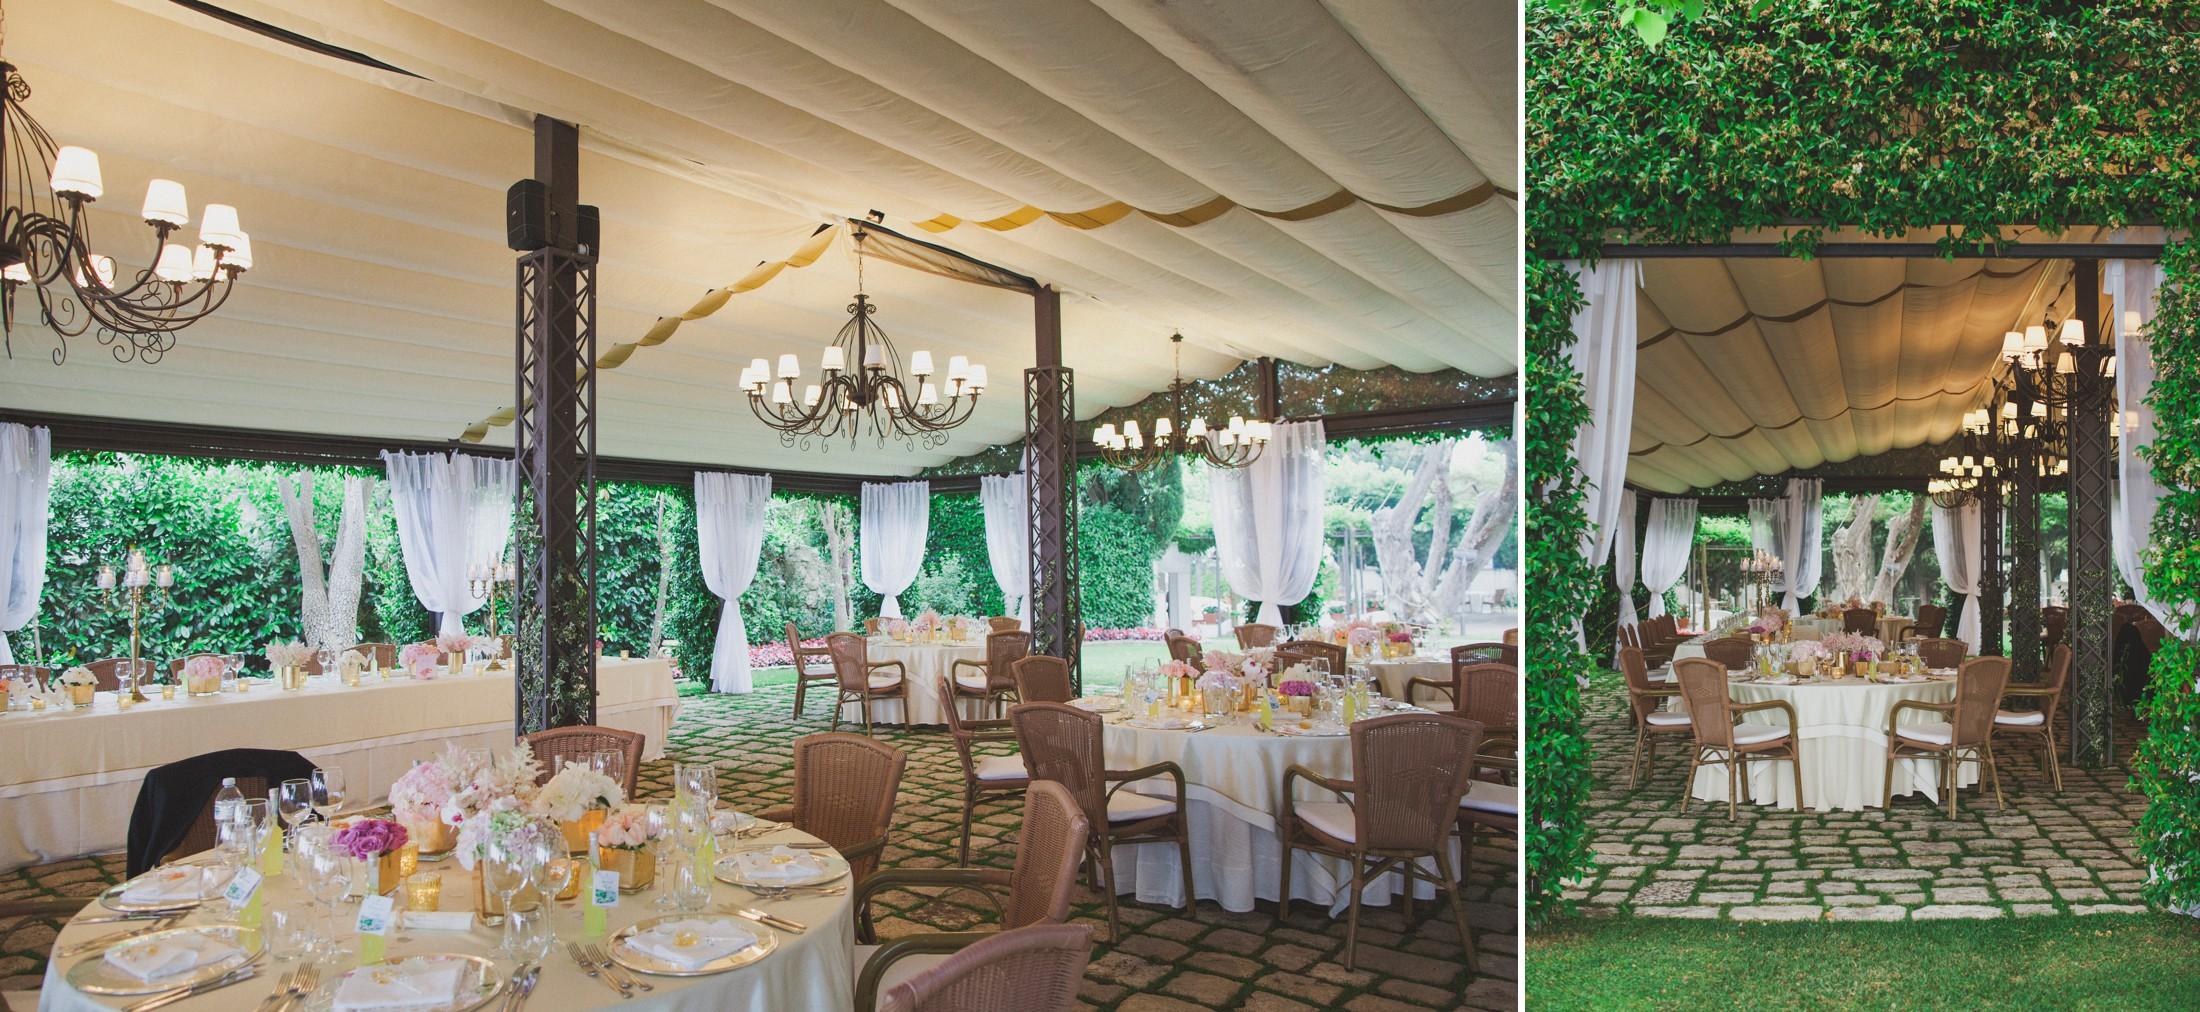 villa eva, wedding location in ravello